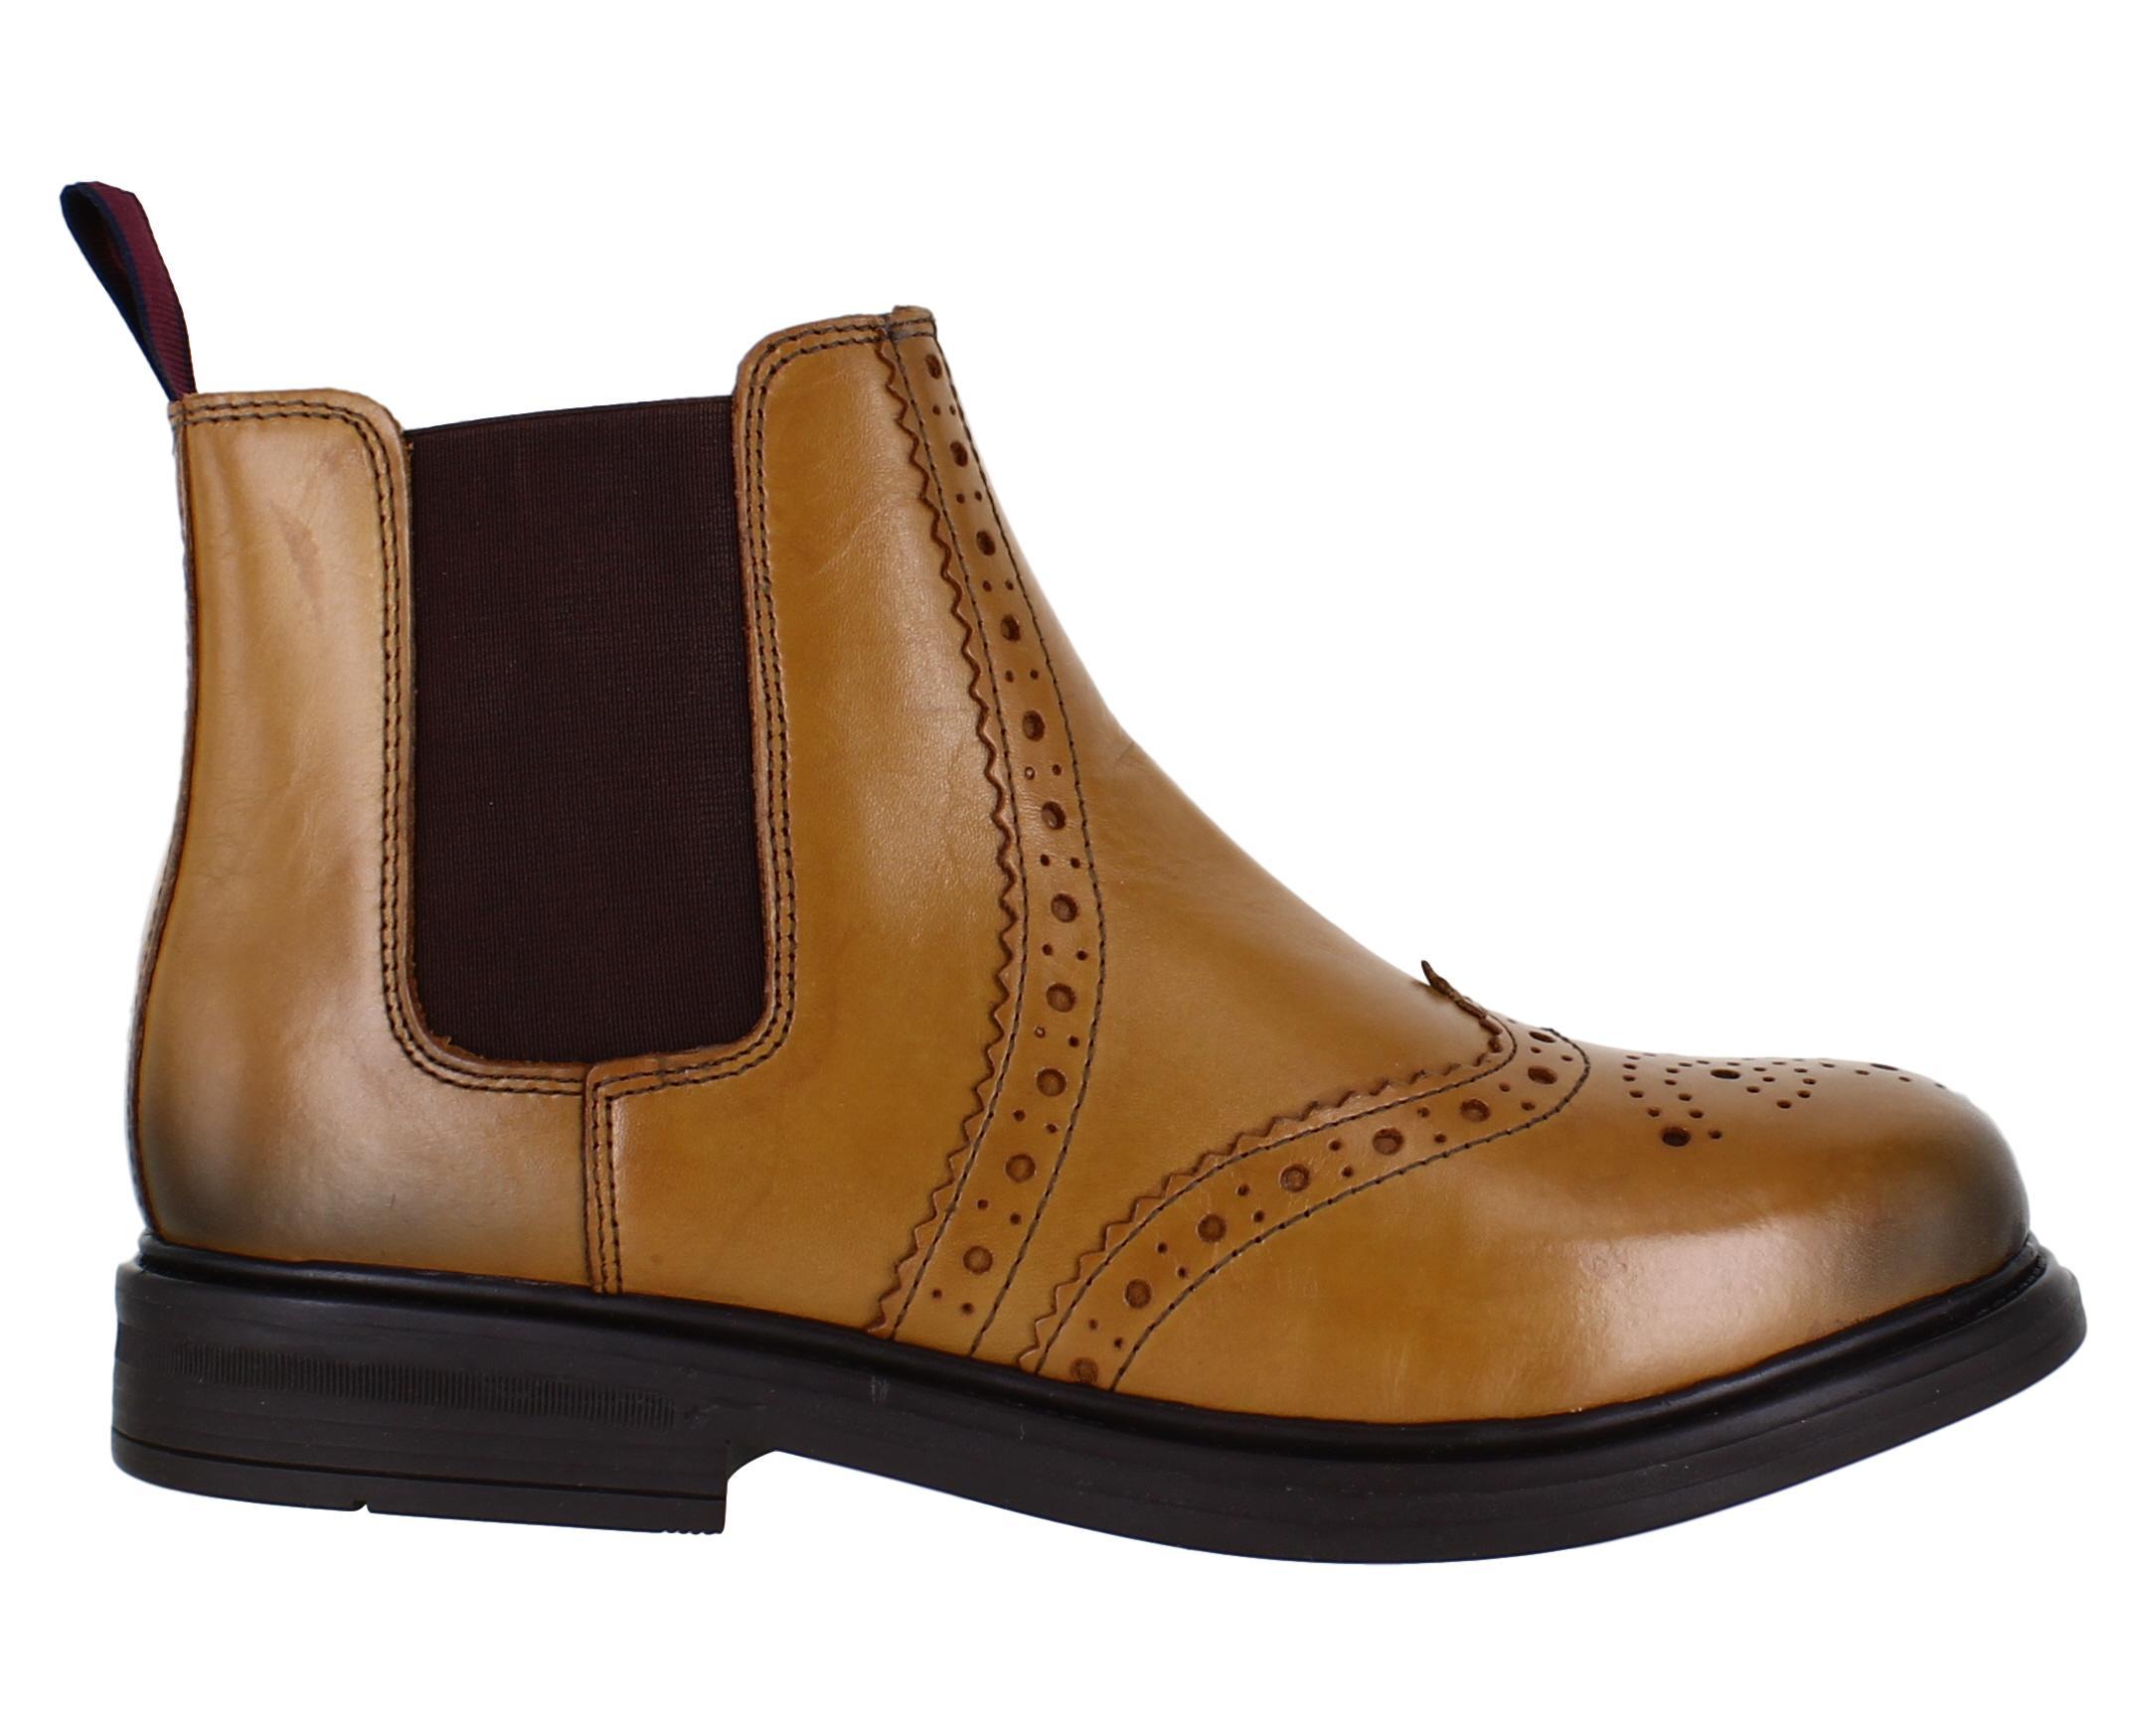 Boys Brown Leather Brogue Chelsea Dealer Ankle Boots Sizes UK 9-6 Catesby CX30DE